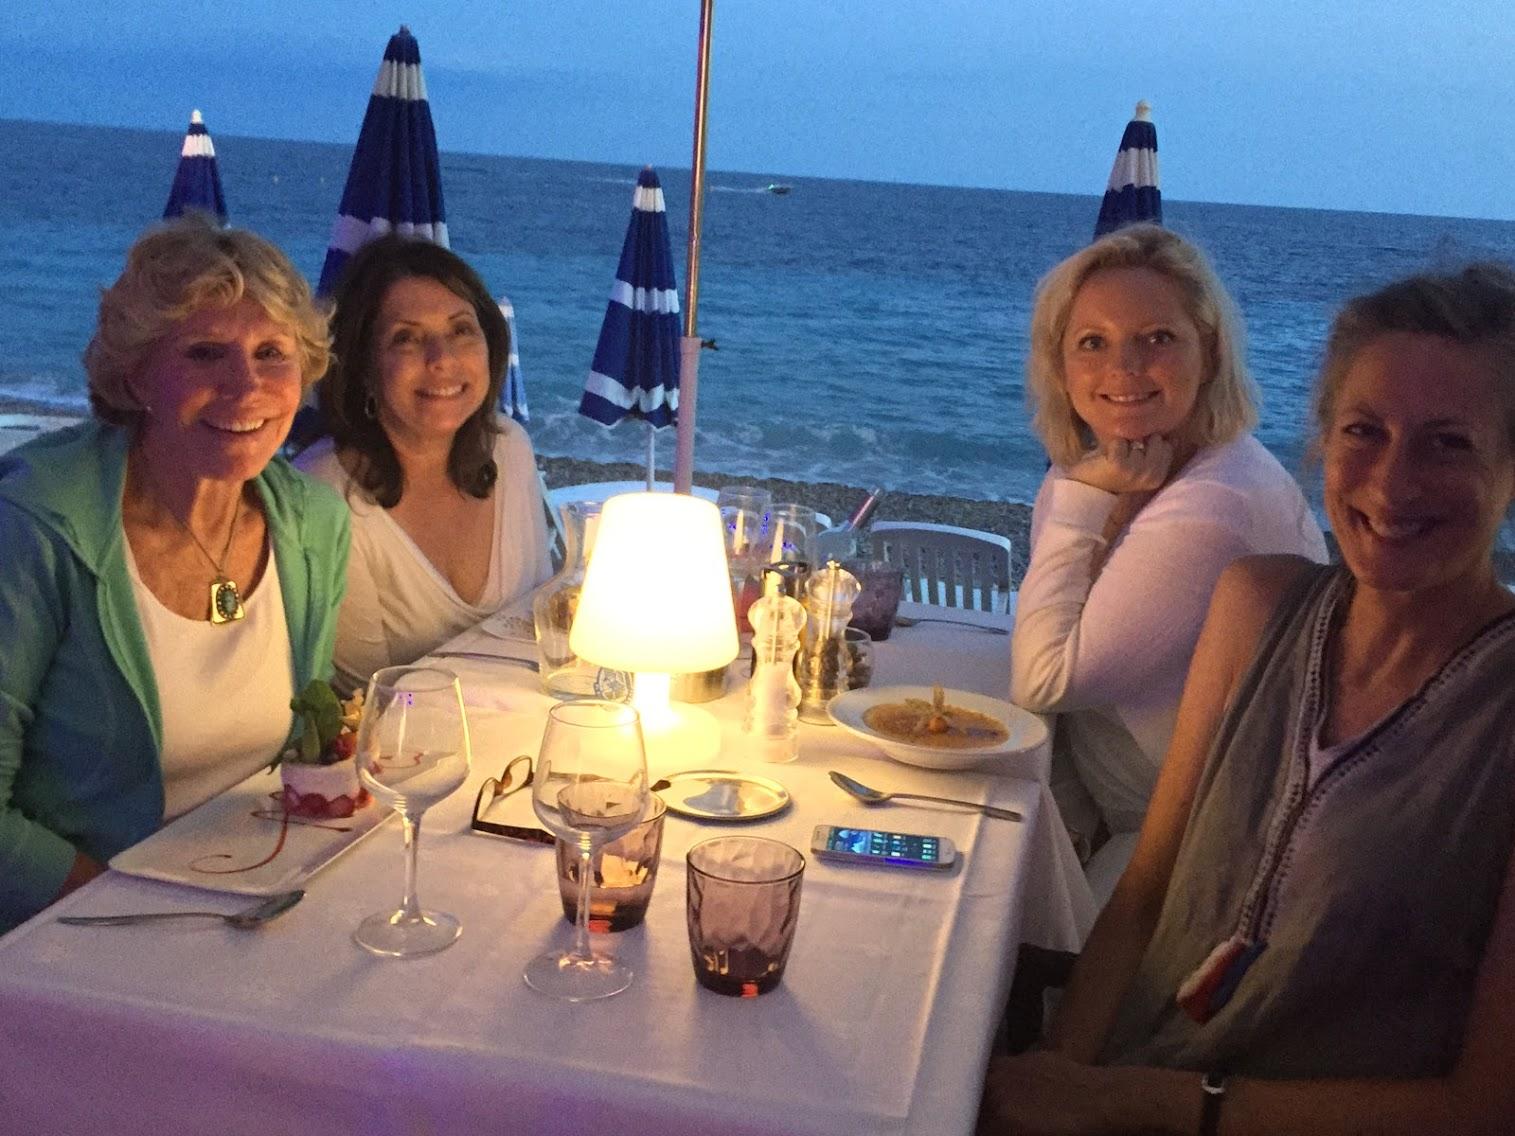 Group at dinner2